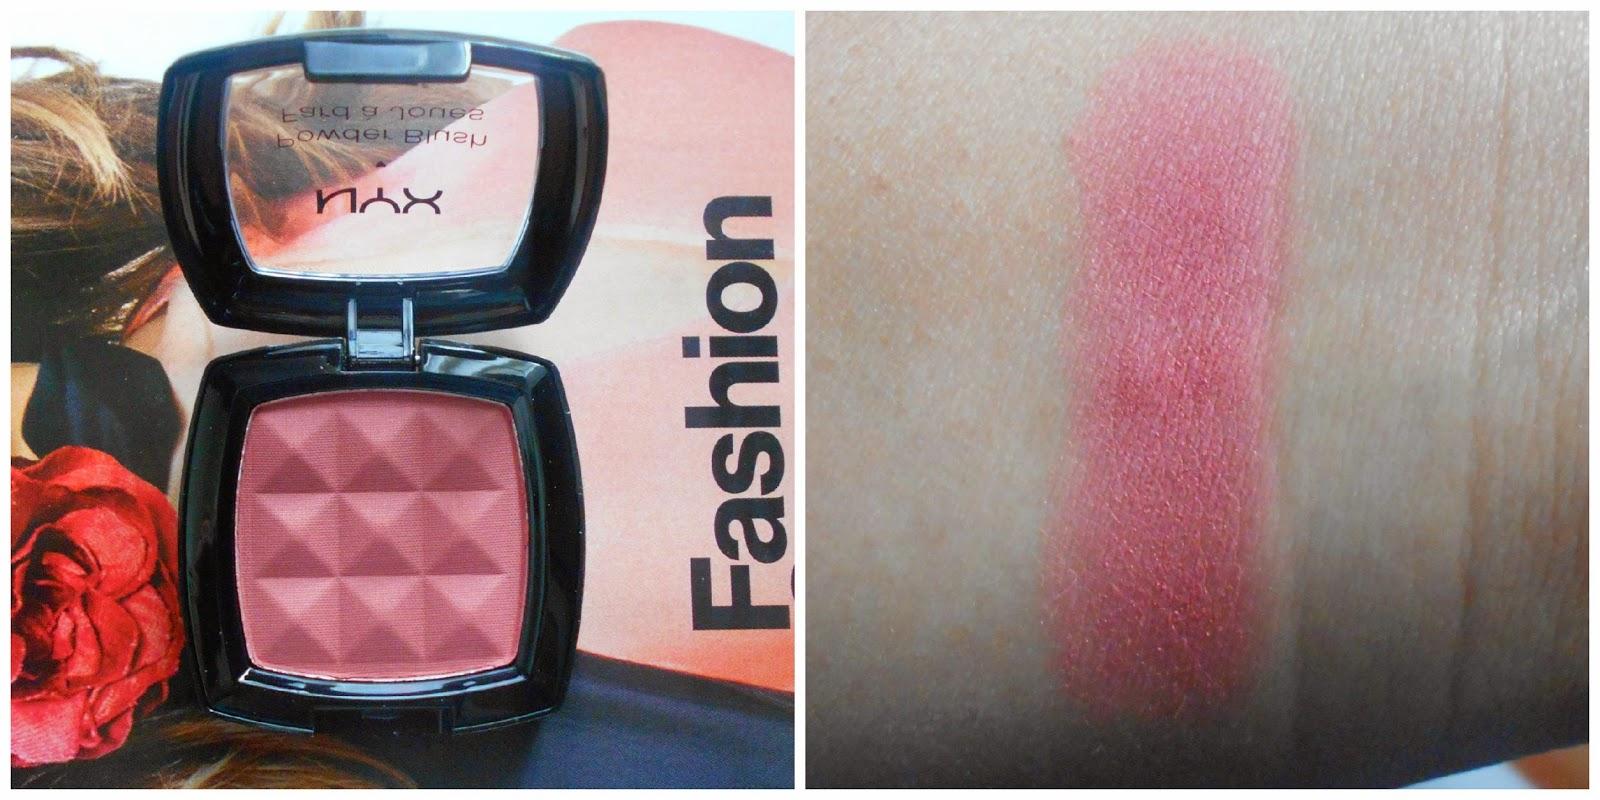 NYX Cosmetics Powder Blush in Dusty Rose